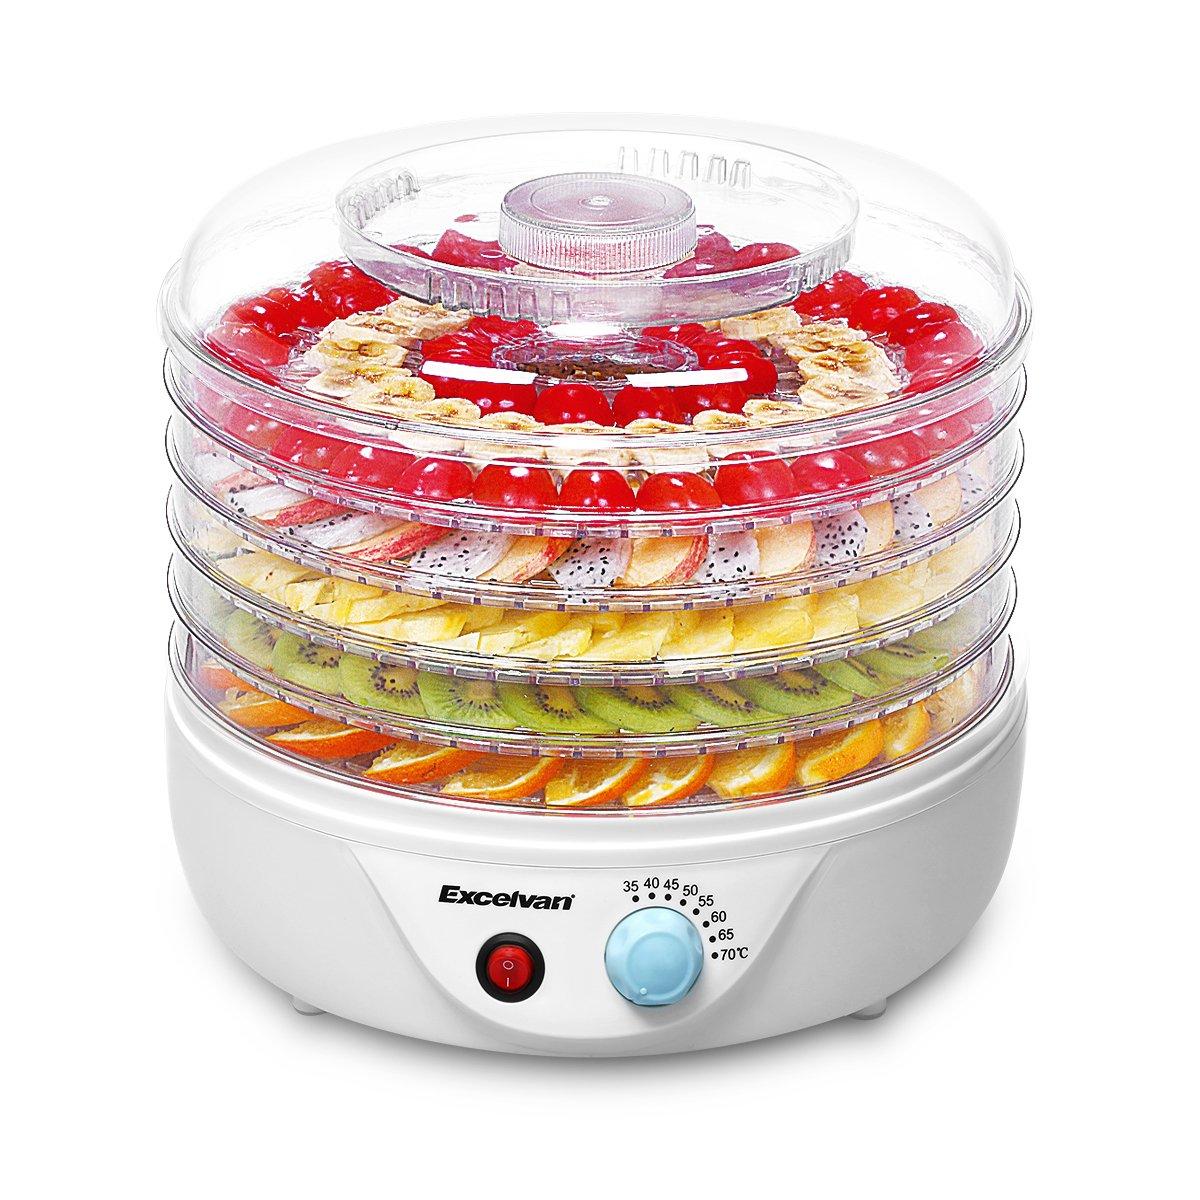 Excelvan 5 Tier 240W Electric Food Fruit Dehydrator Preserver Airflow Circulation with Adjustable Temperature Control Natural Healthy